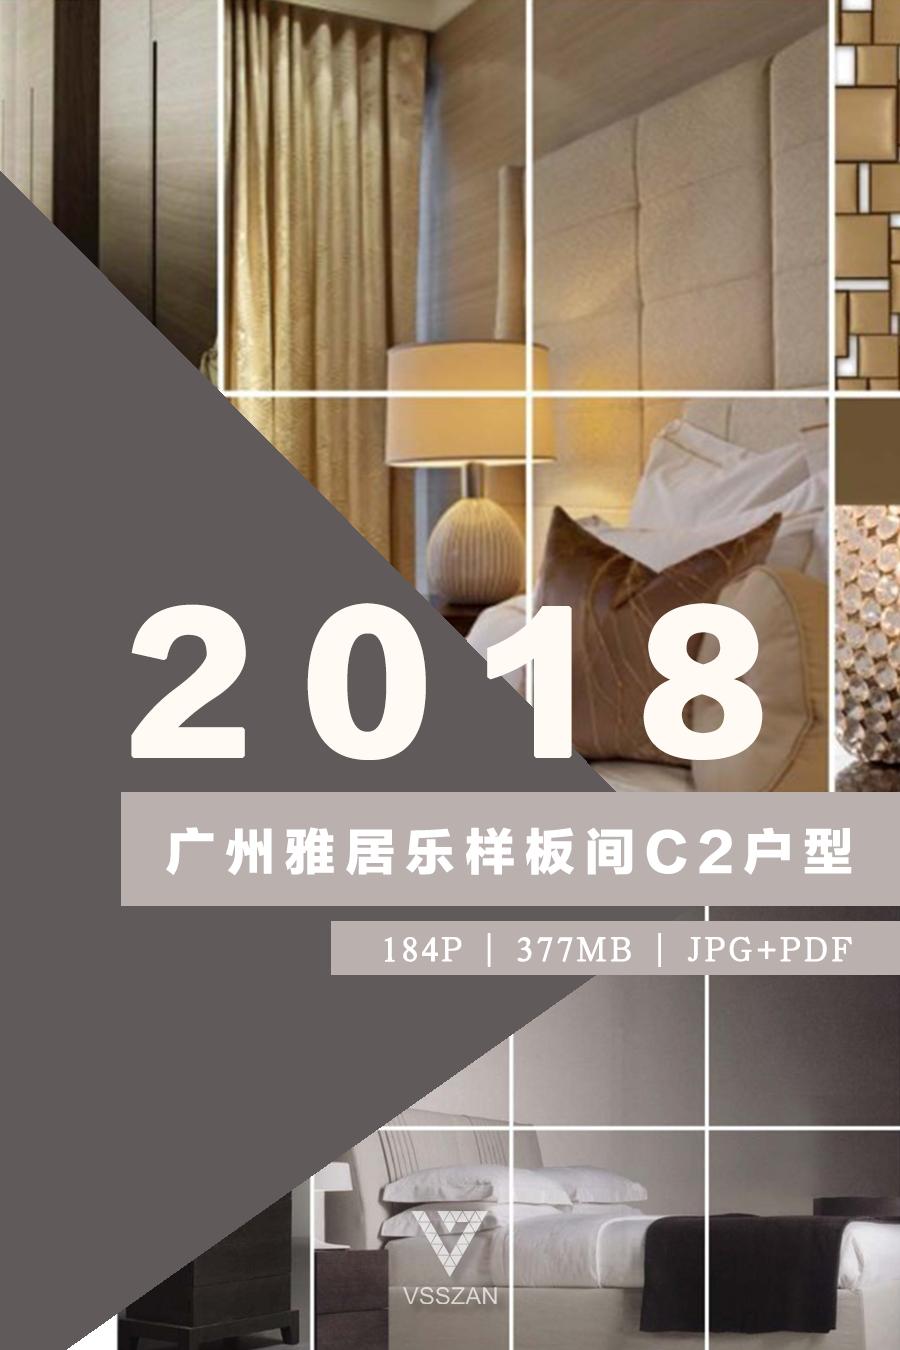 【LTW】广州雅居乐样板间C2户型.png